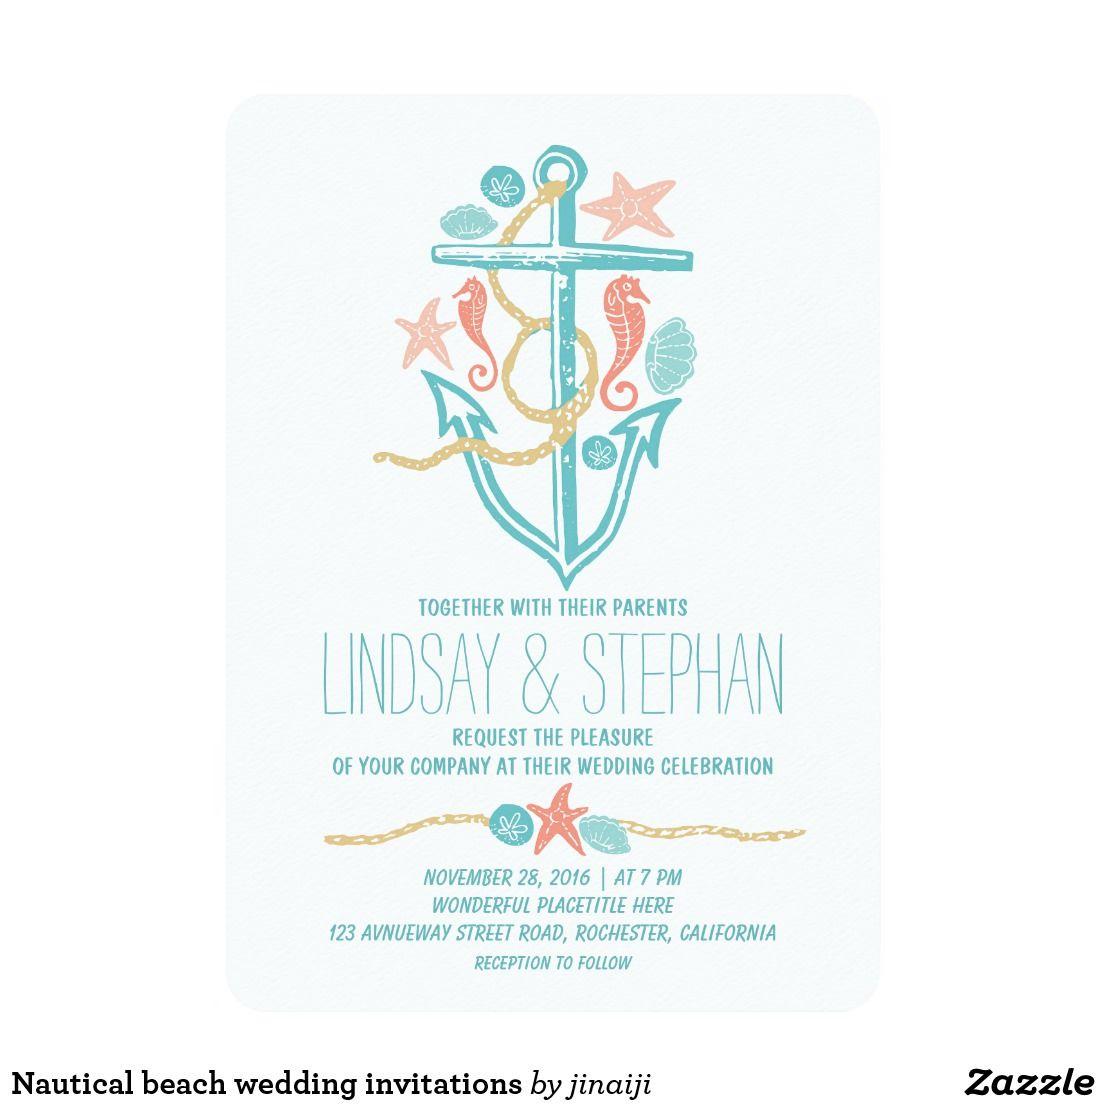 Nautical beach wedding invitations | Beach Wedding Invitations ...